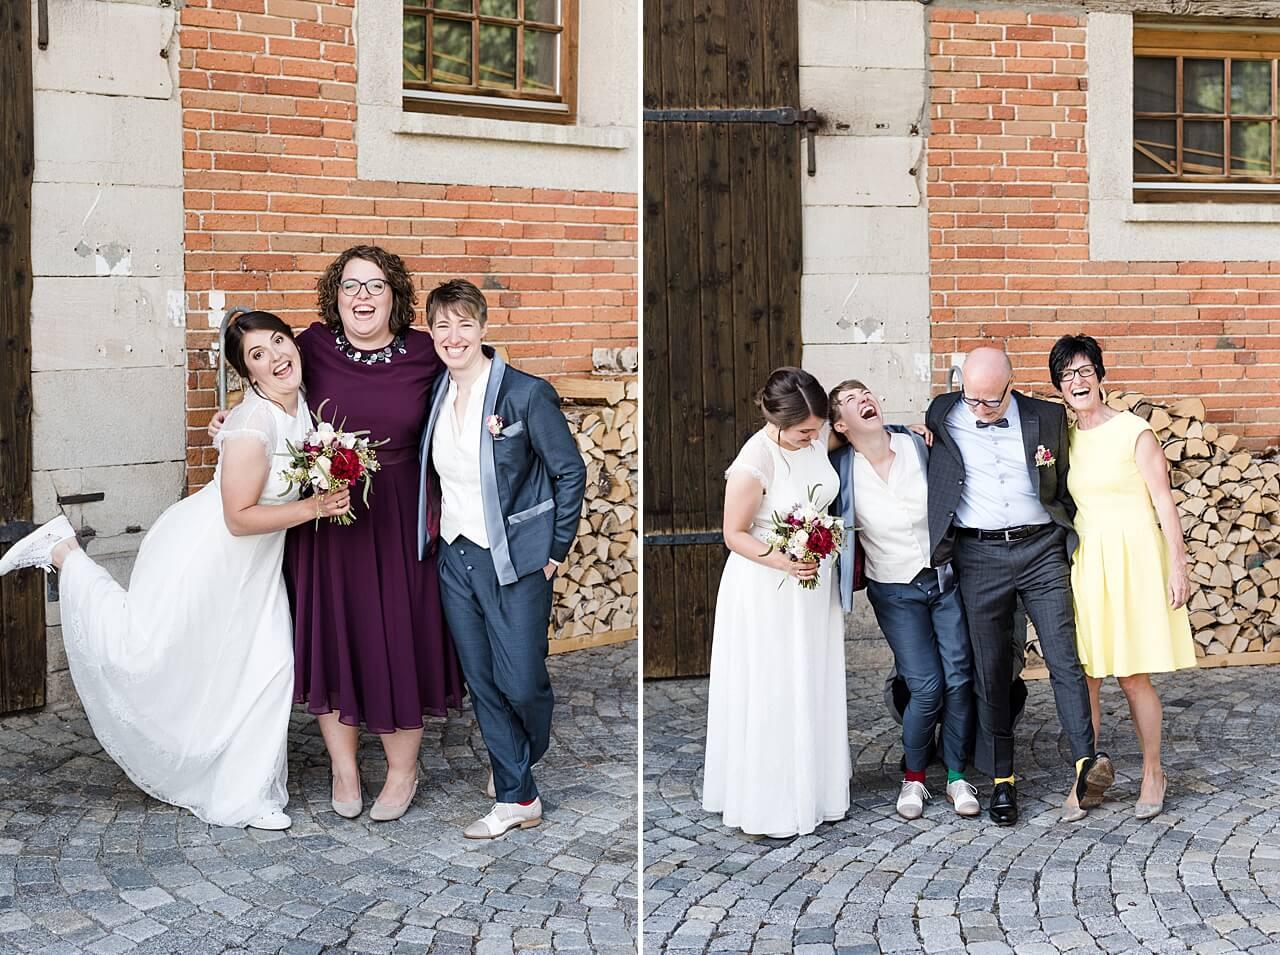 Rebecca Conte Fotografie: Love is Love - Freie Trauung 36